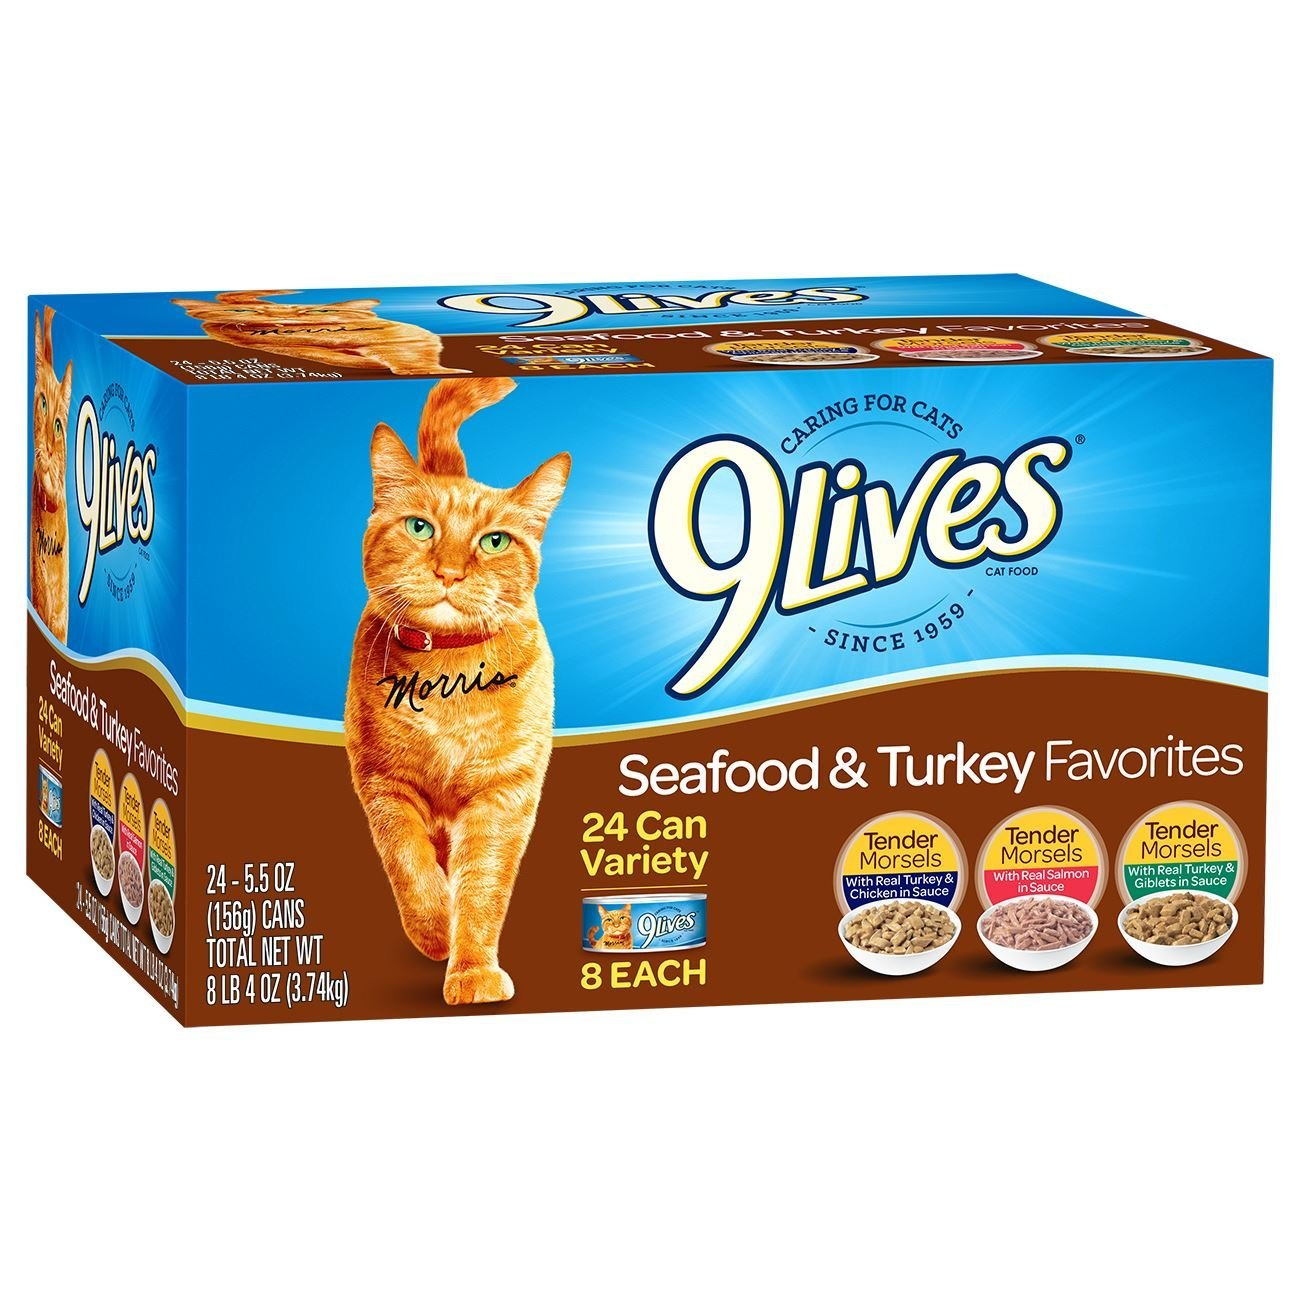 9 Lives Turkey & Seafood Favorites Wet Cat Food Variety (24 Pack), 5.5 Oz